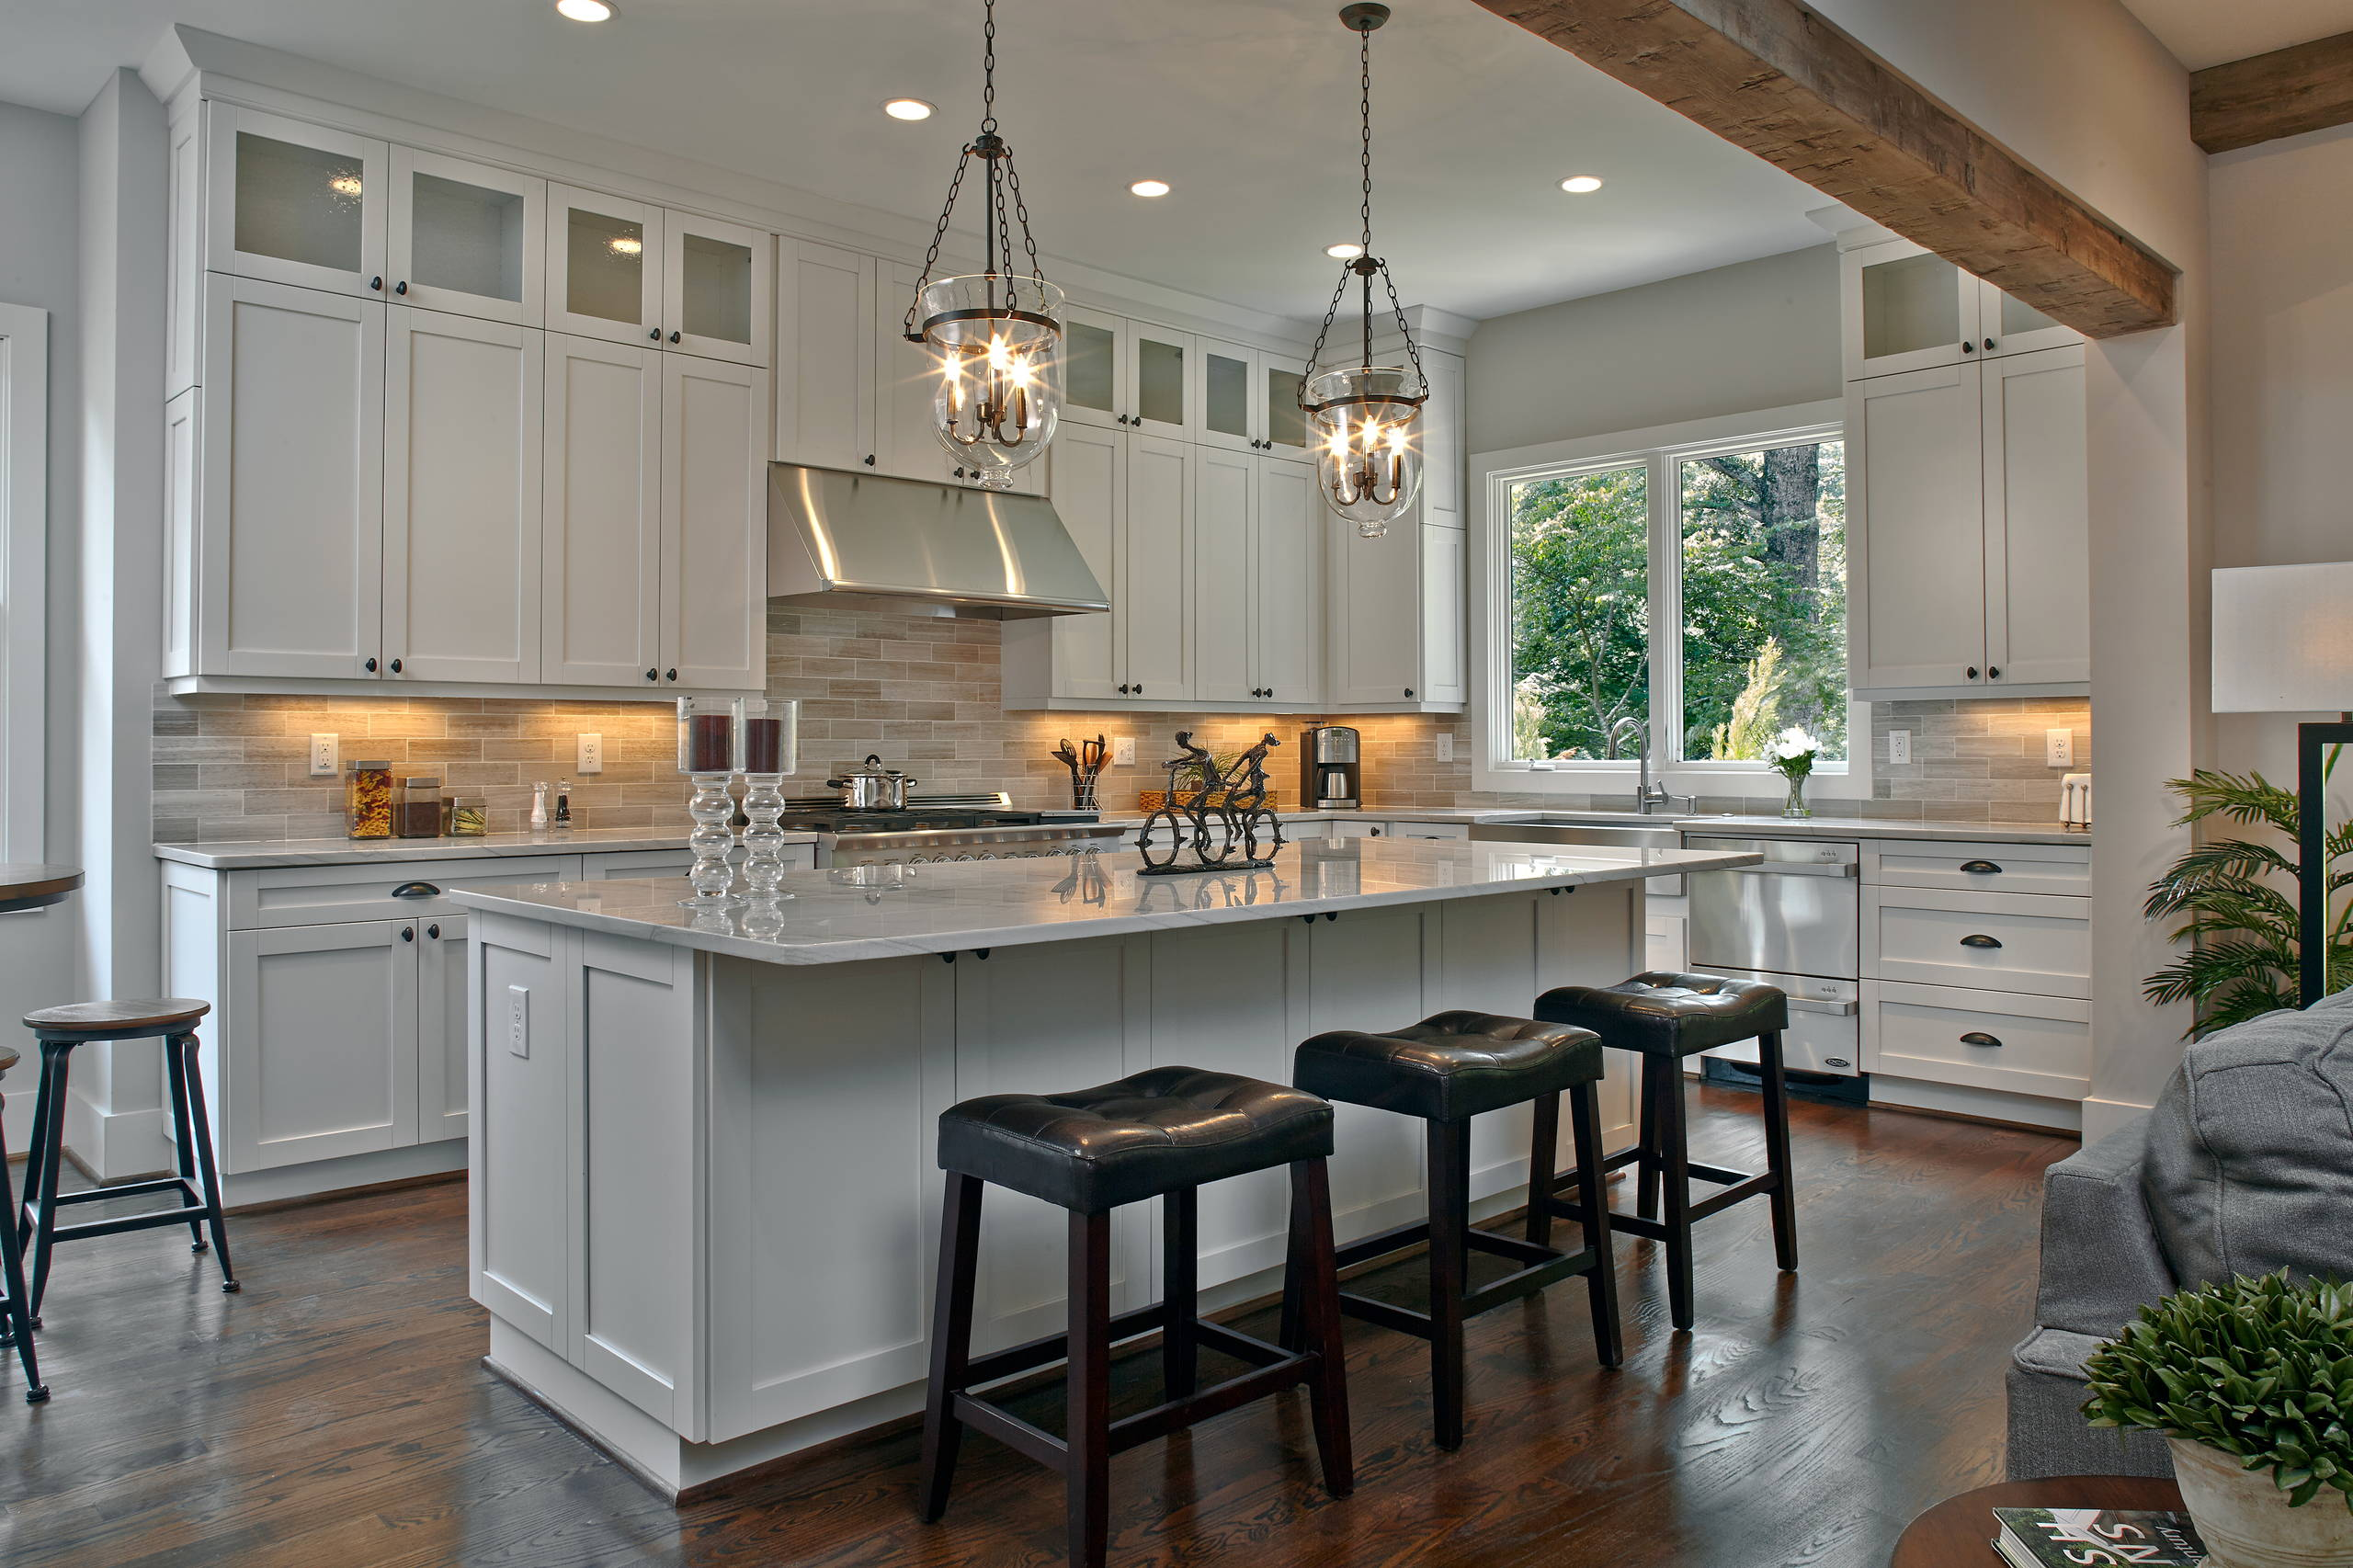 Dark Floors White Cabinets Traditional Kitchen Double Drawer Dishwasher Marble Countertops Stone Backsplash